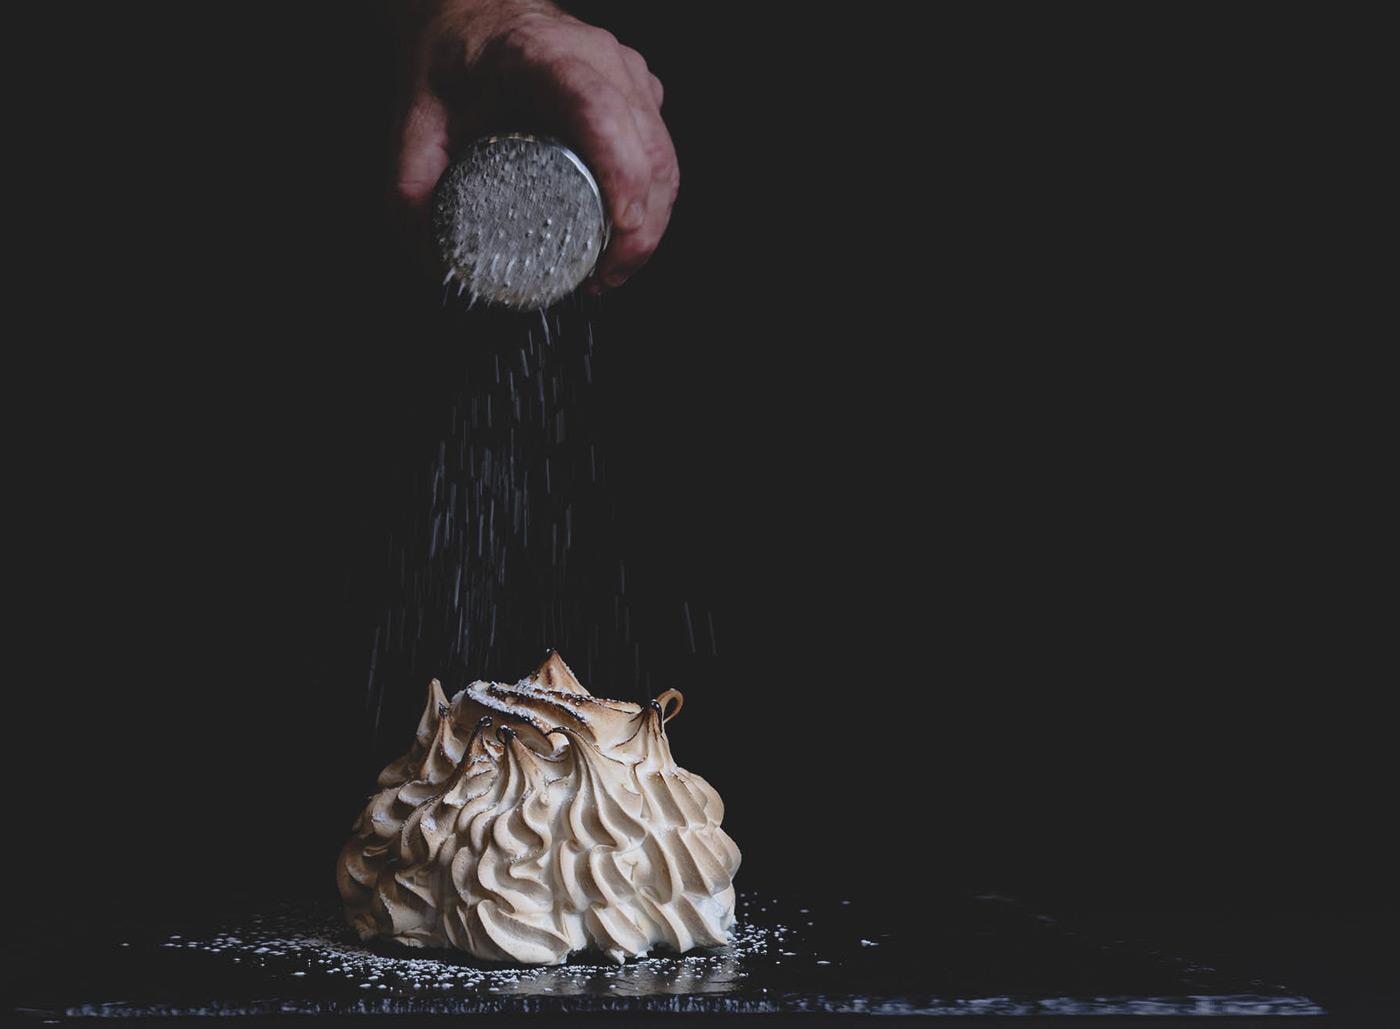 Guy Harrop food photography